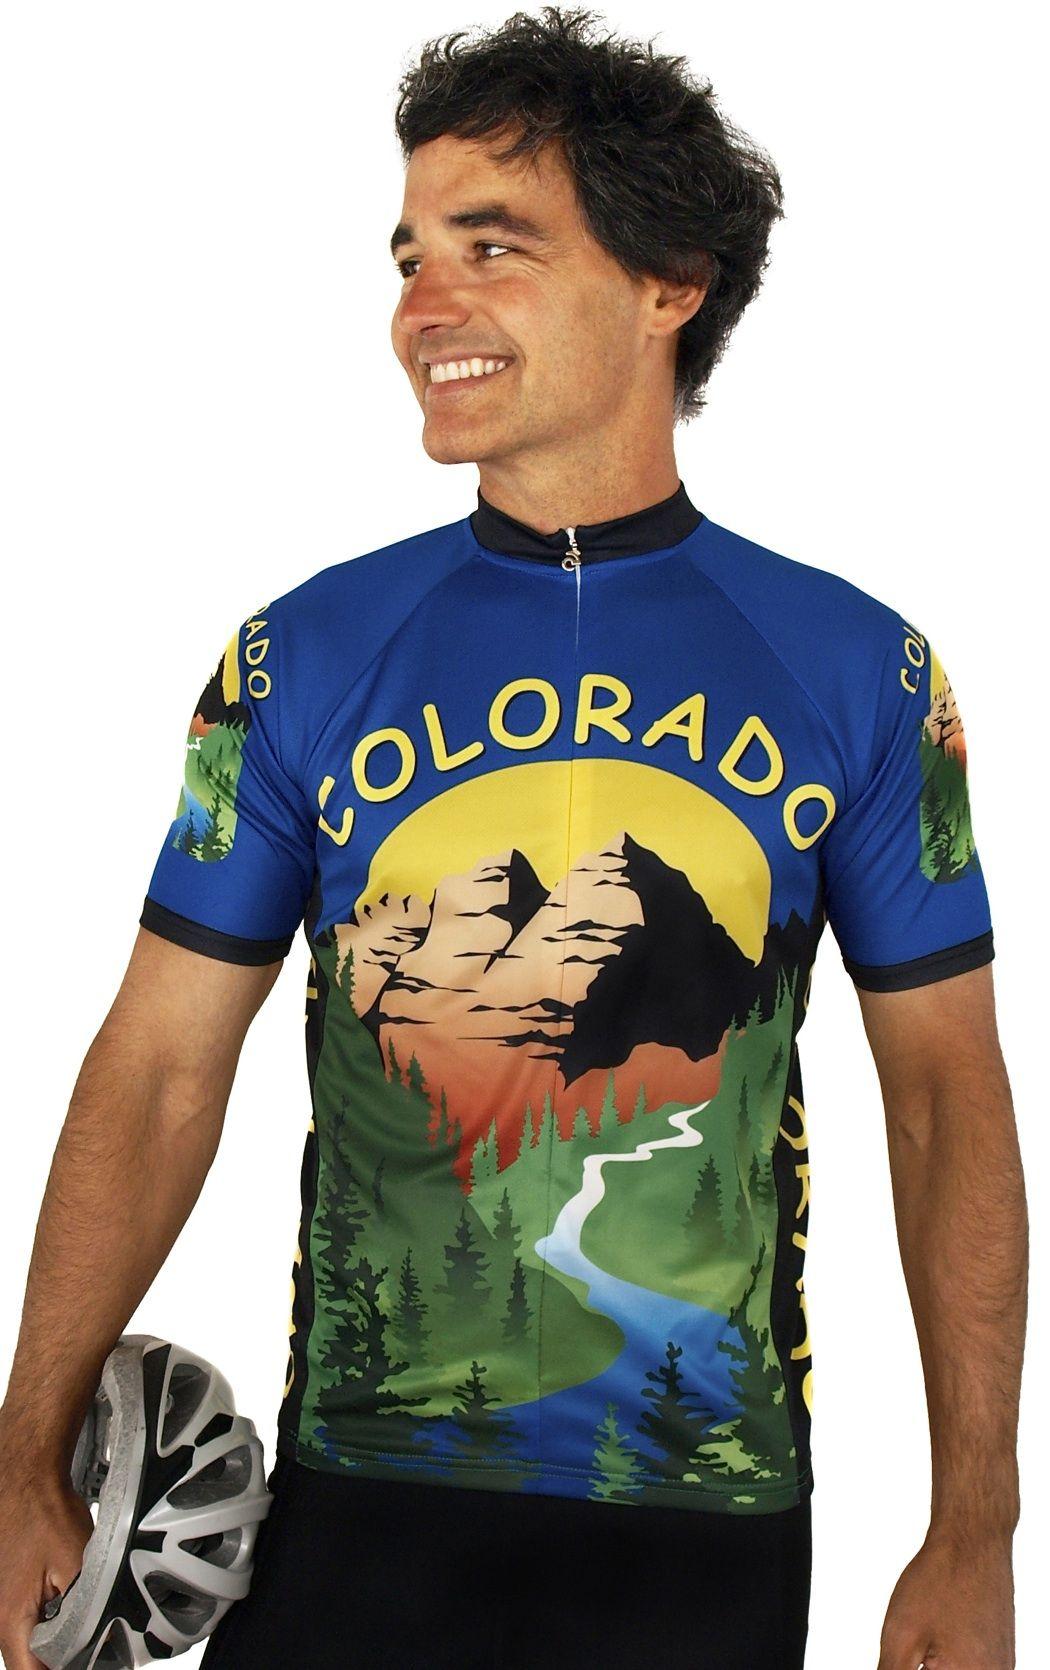 Colorado Cycling Jersey Bike jersey design, Bike jersey